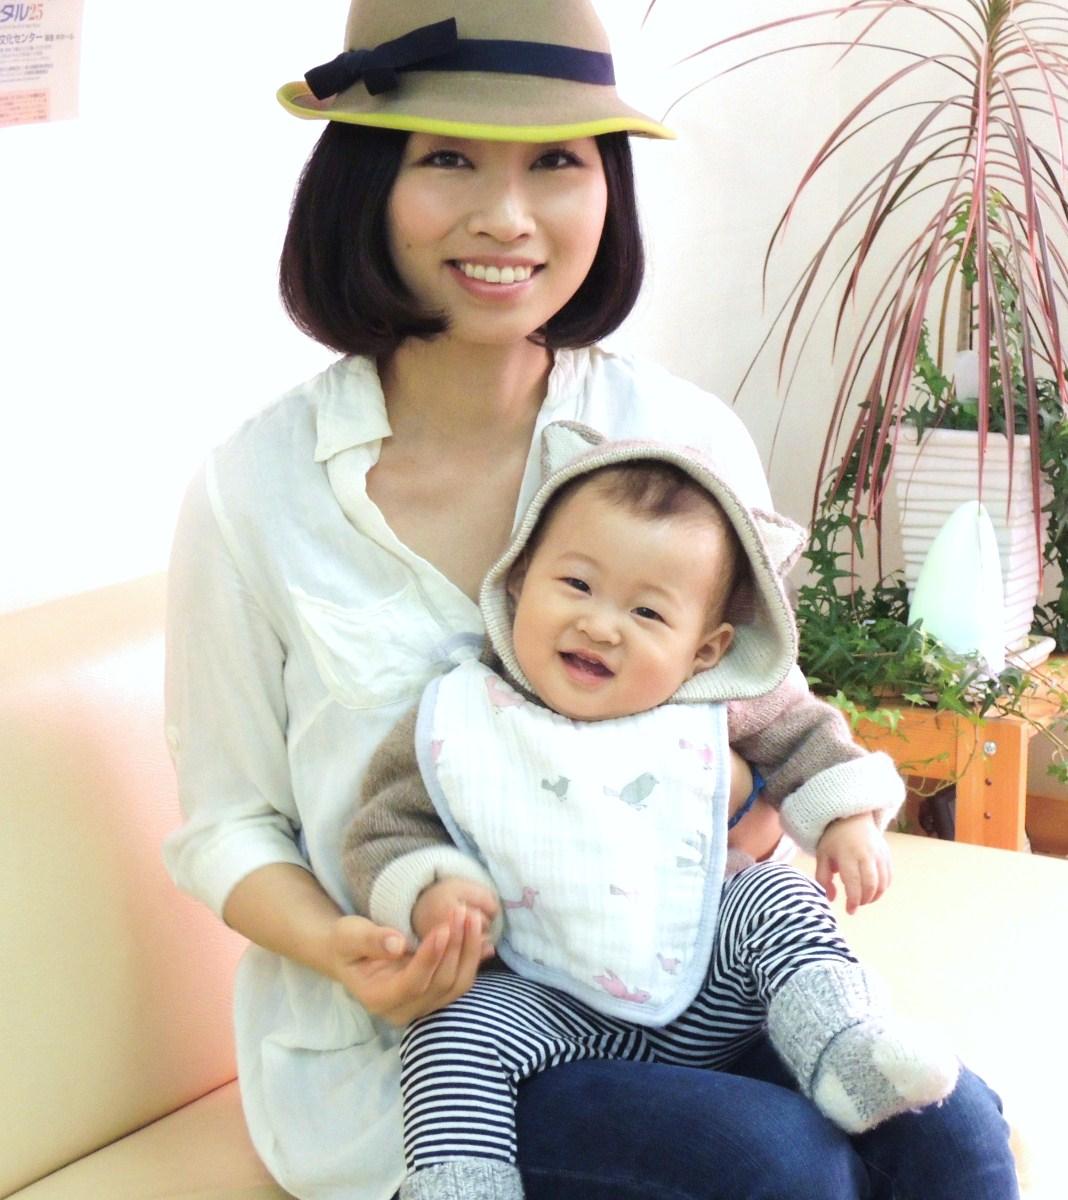 産後骨盤矯正 神戸市垂水区Nさま (2).jpg